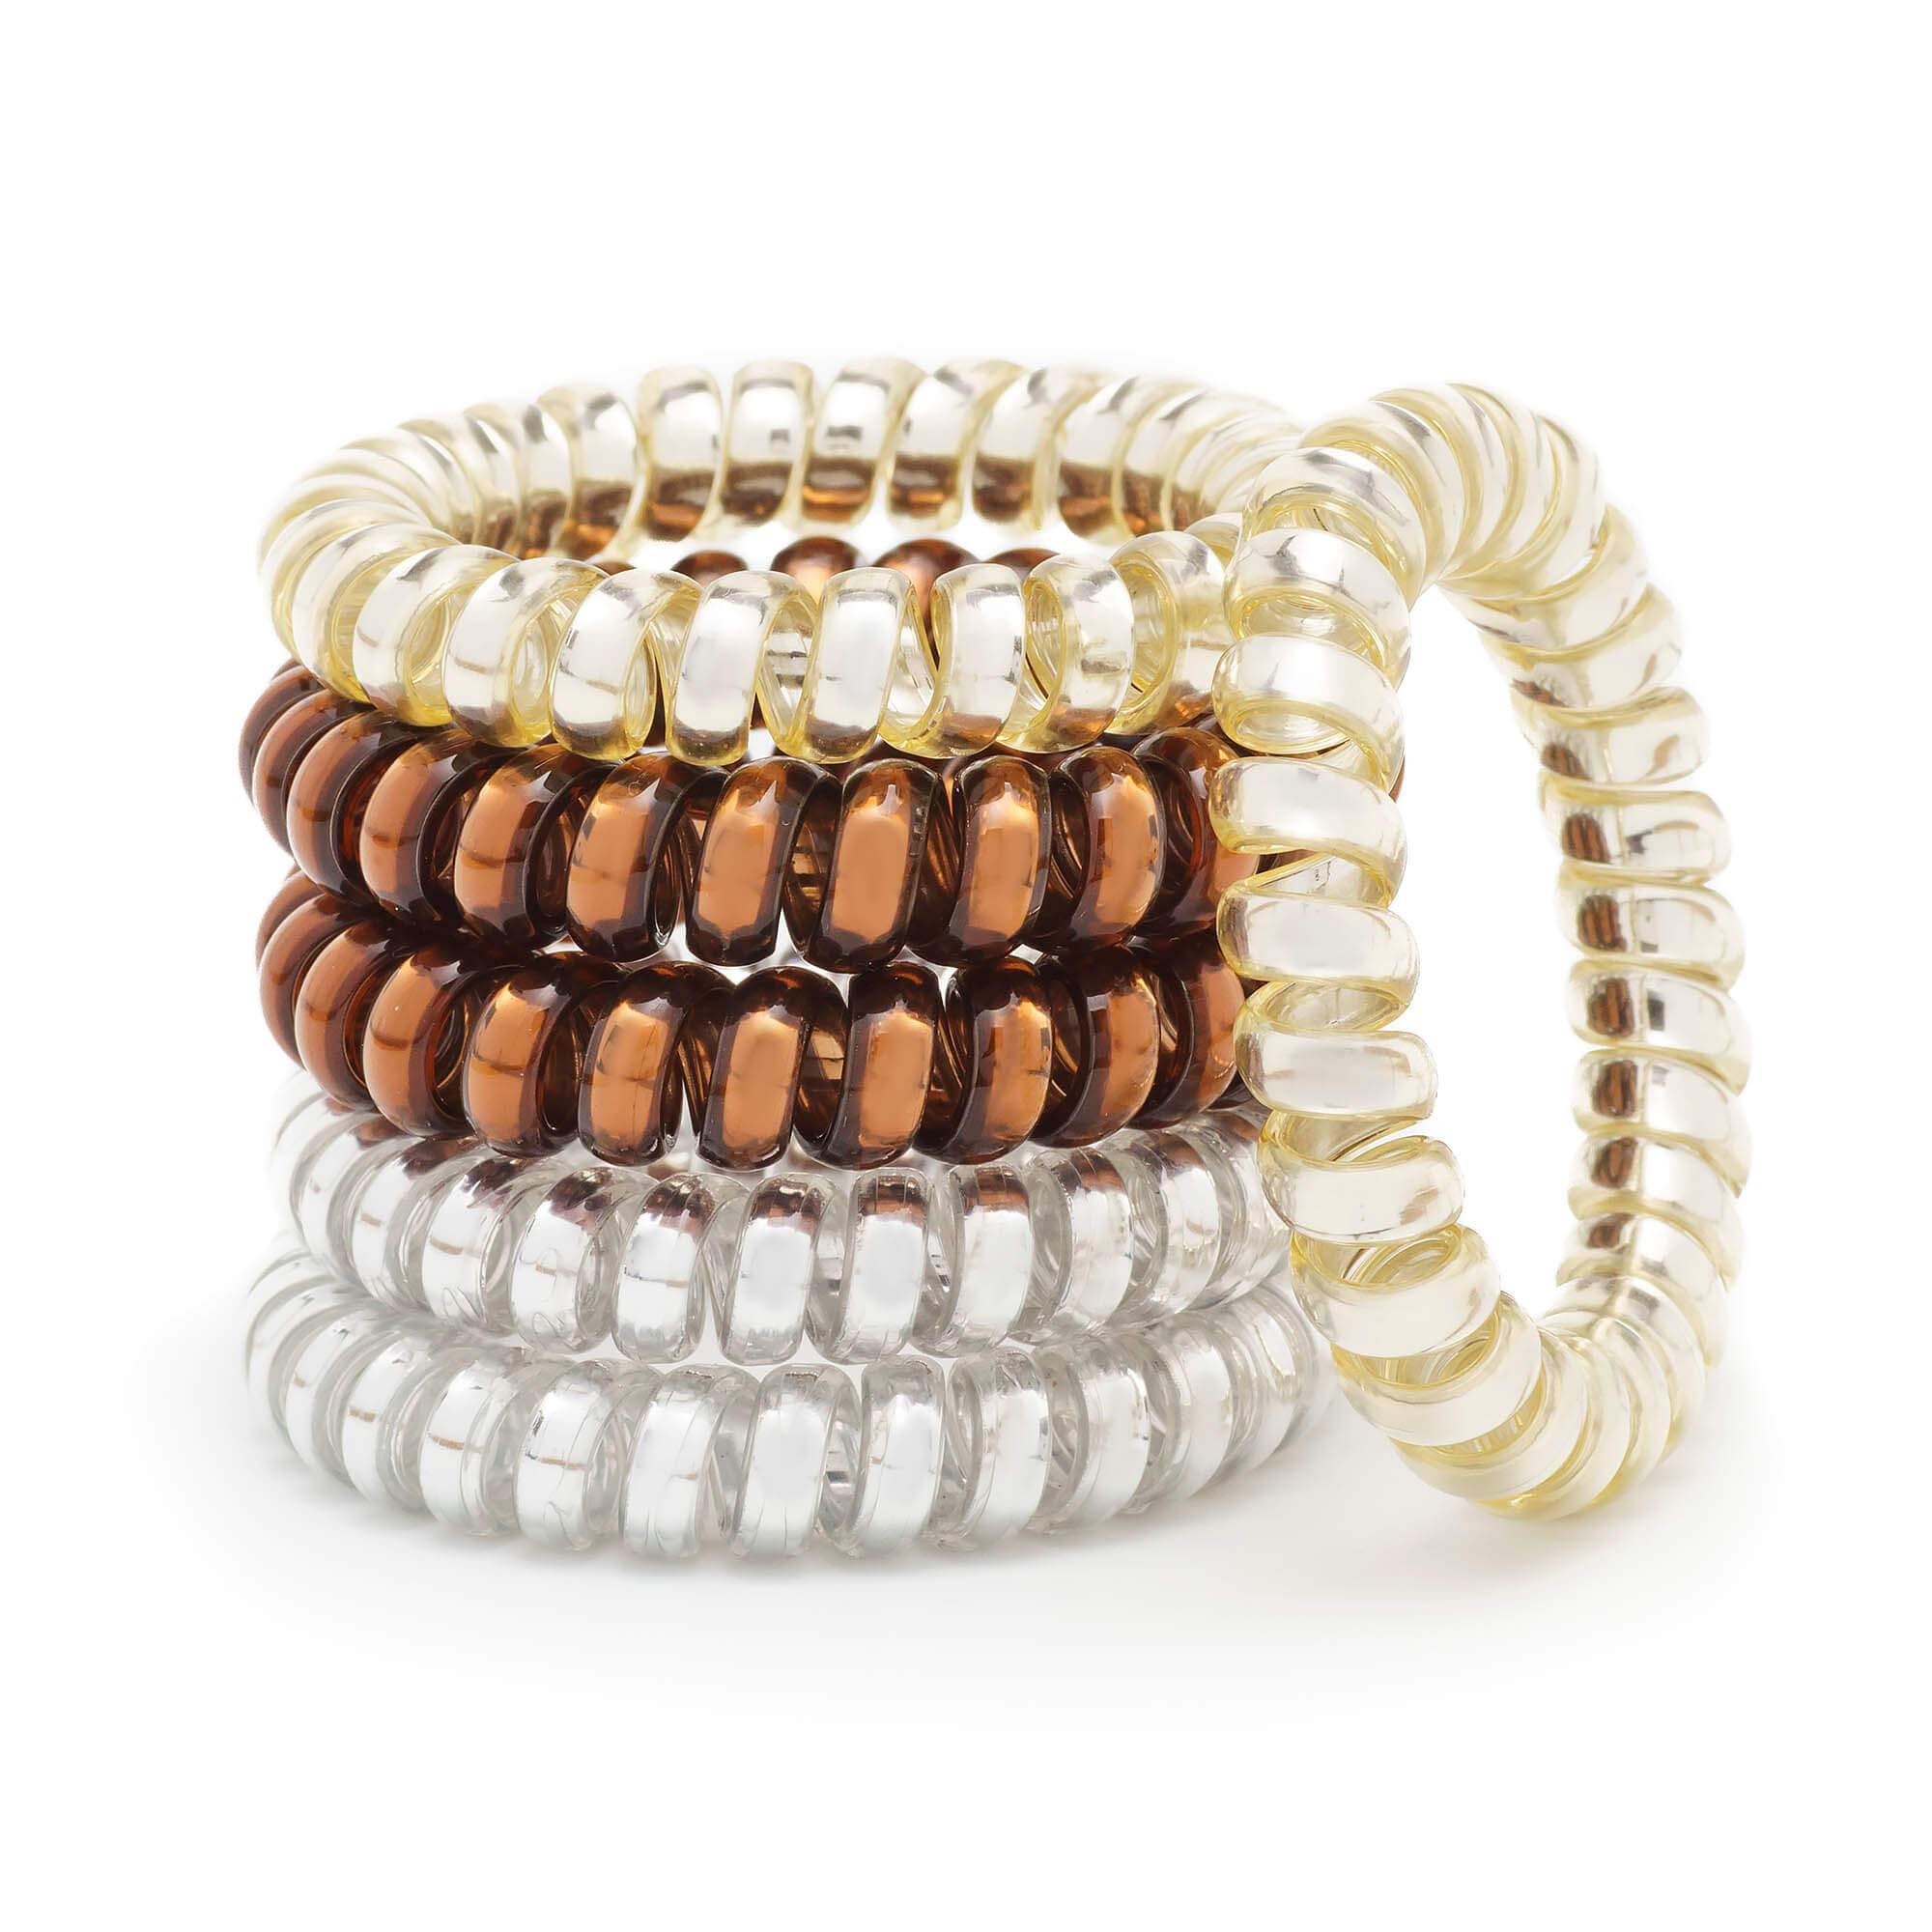 MiSpace Plastic Hair Ties Spiral for Thick Hair, No Crease, Set of 6 Elastic Hair Ties (Metallic)